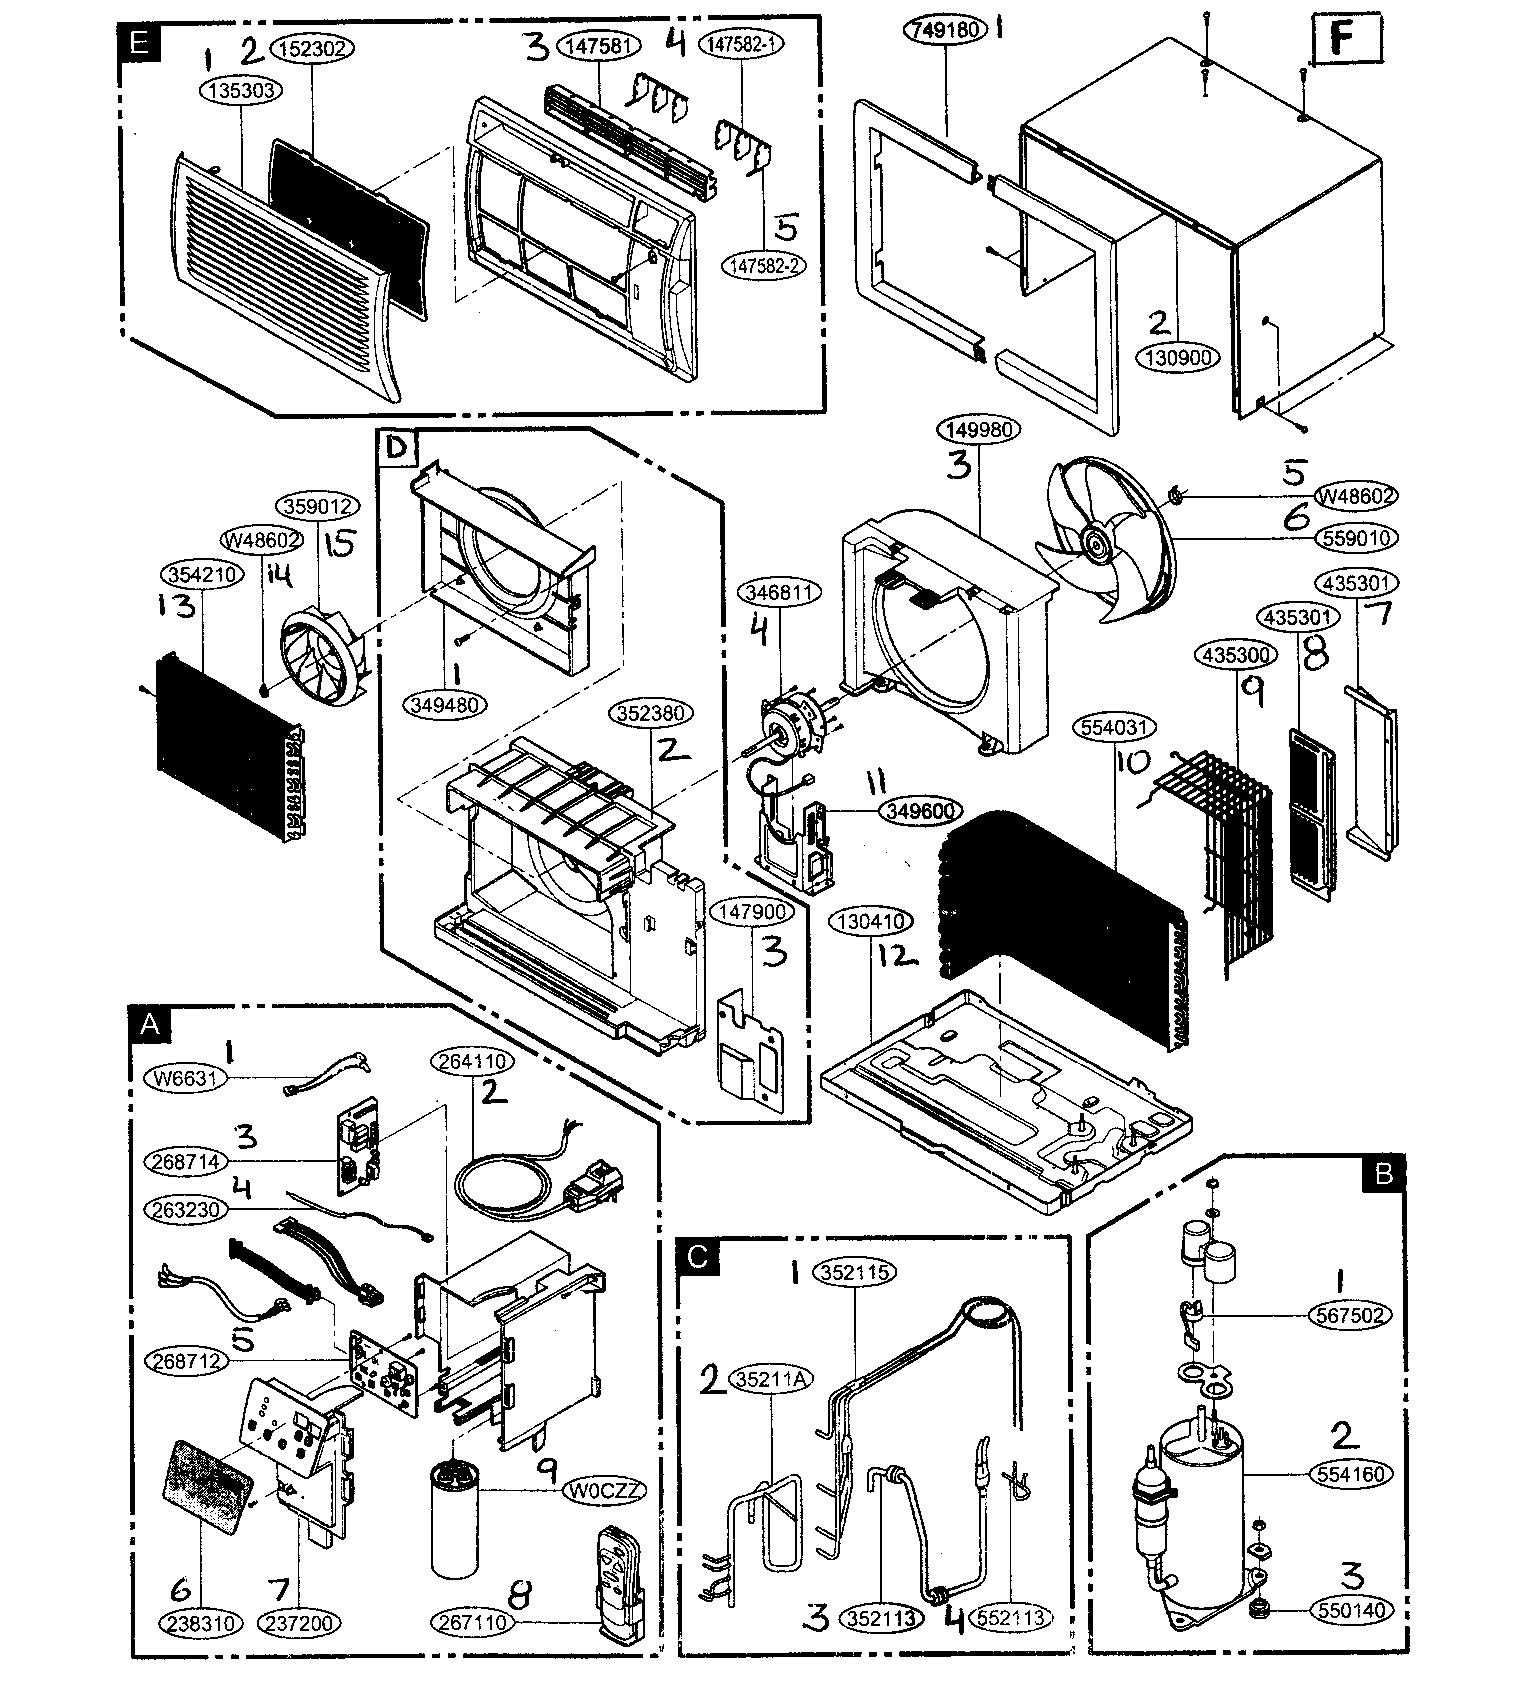 hight resolution of haier air conditioner wiring diagram wiring diagrams tappan air conditioner wiring diagram friedrich model us10b10a air